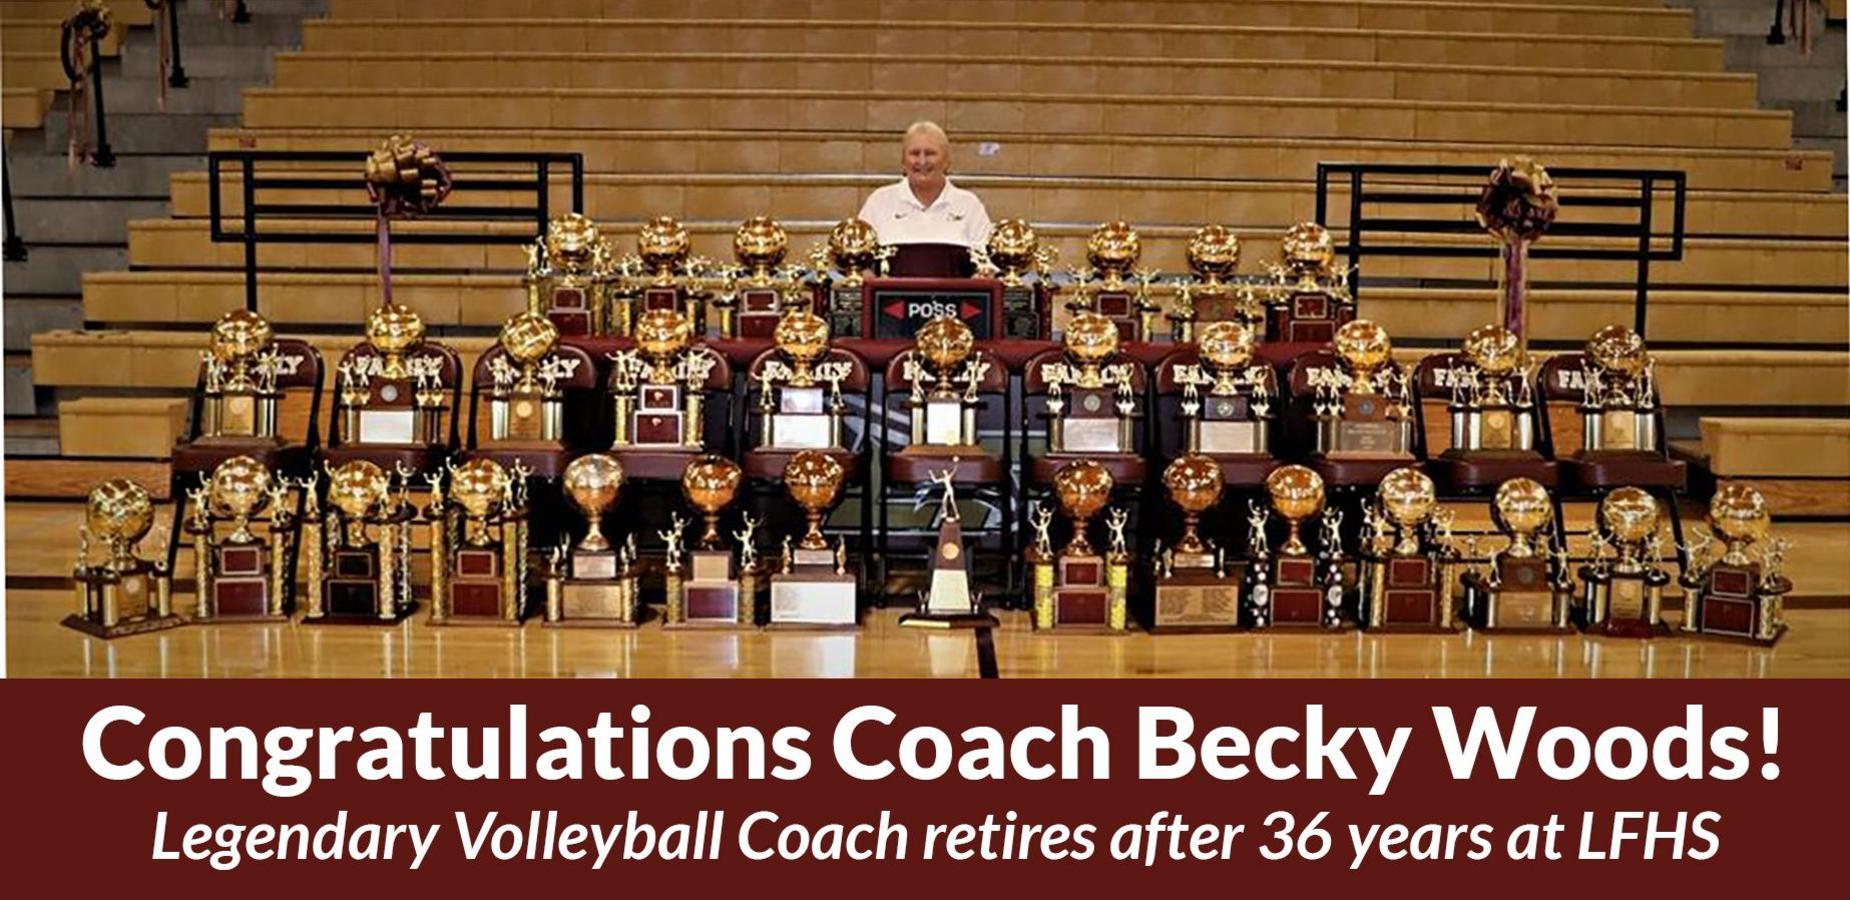 Becky Woods retires